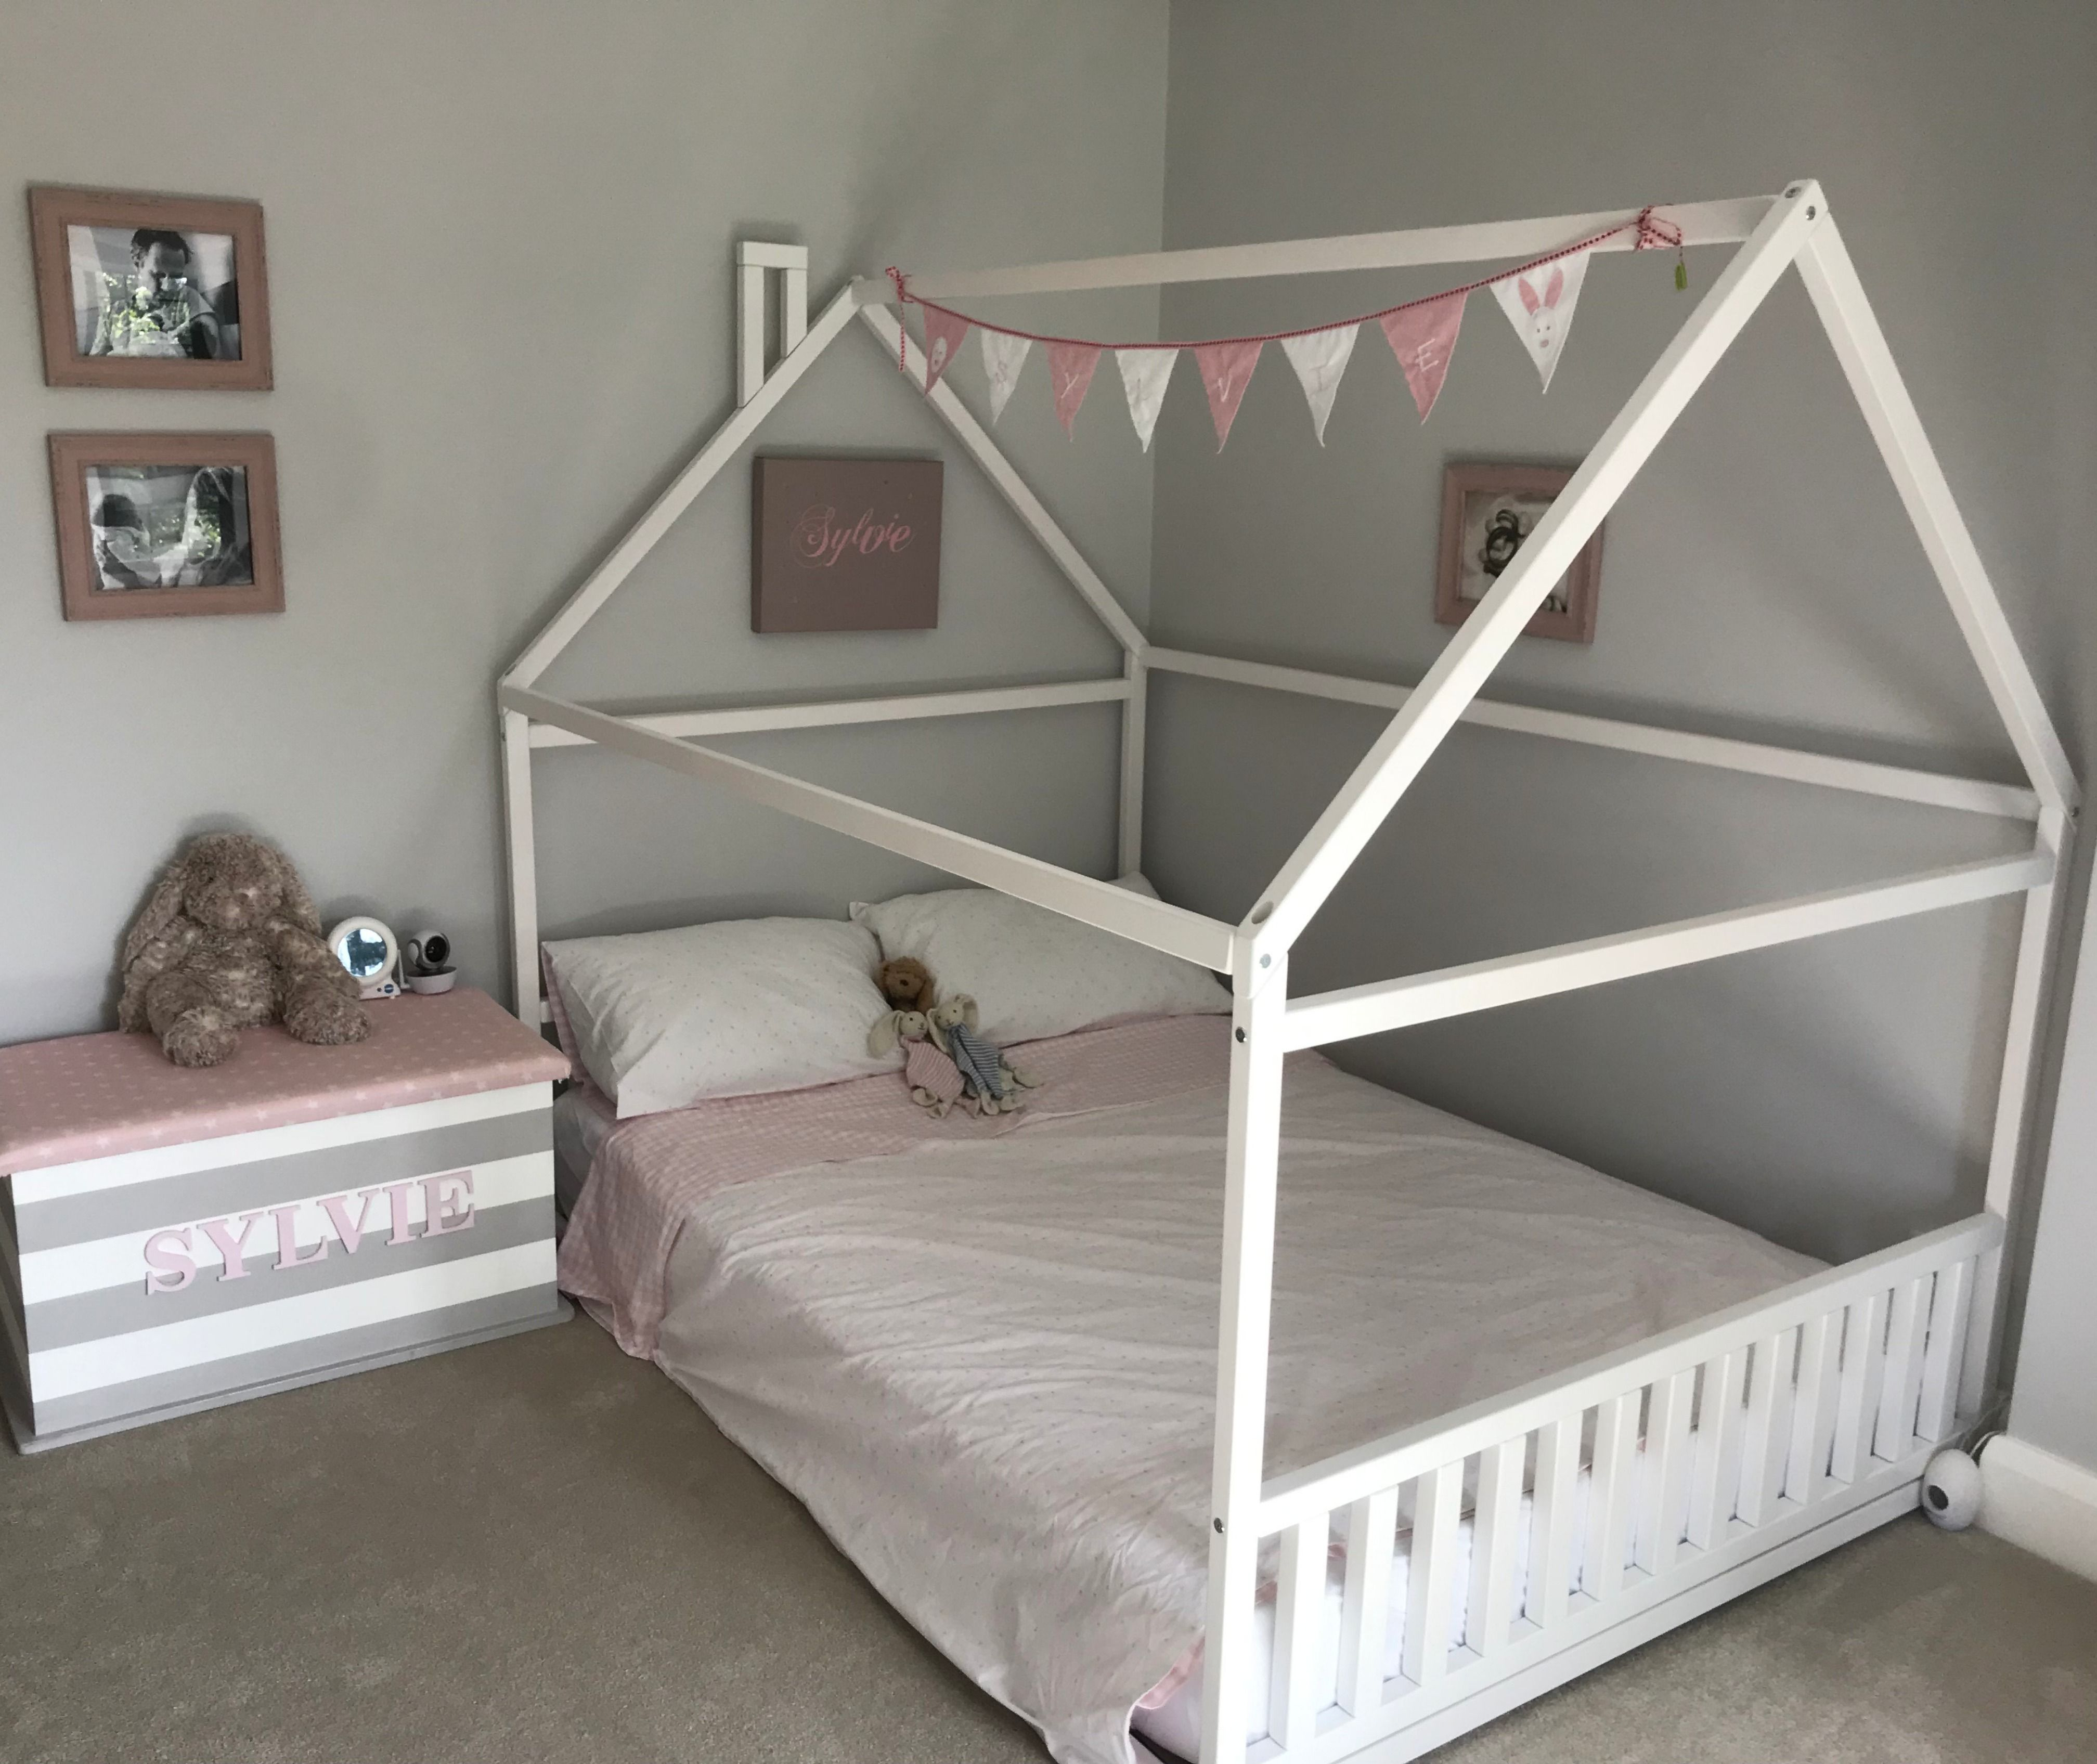 montessori toddler room wooden bed full or queen size for etsy girls kids frames house beds 1920 highboy dresser